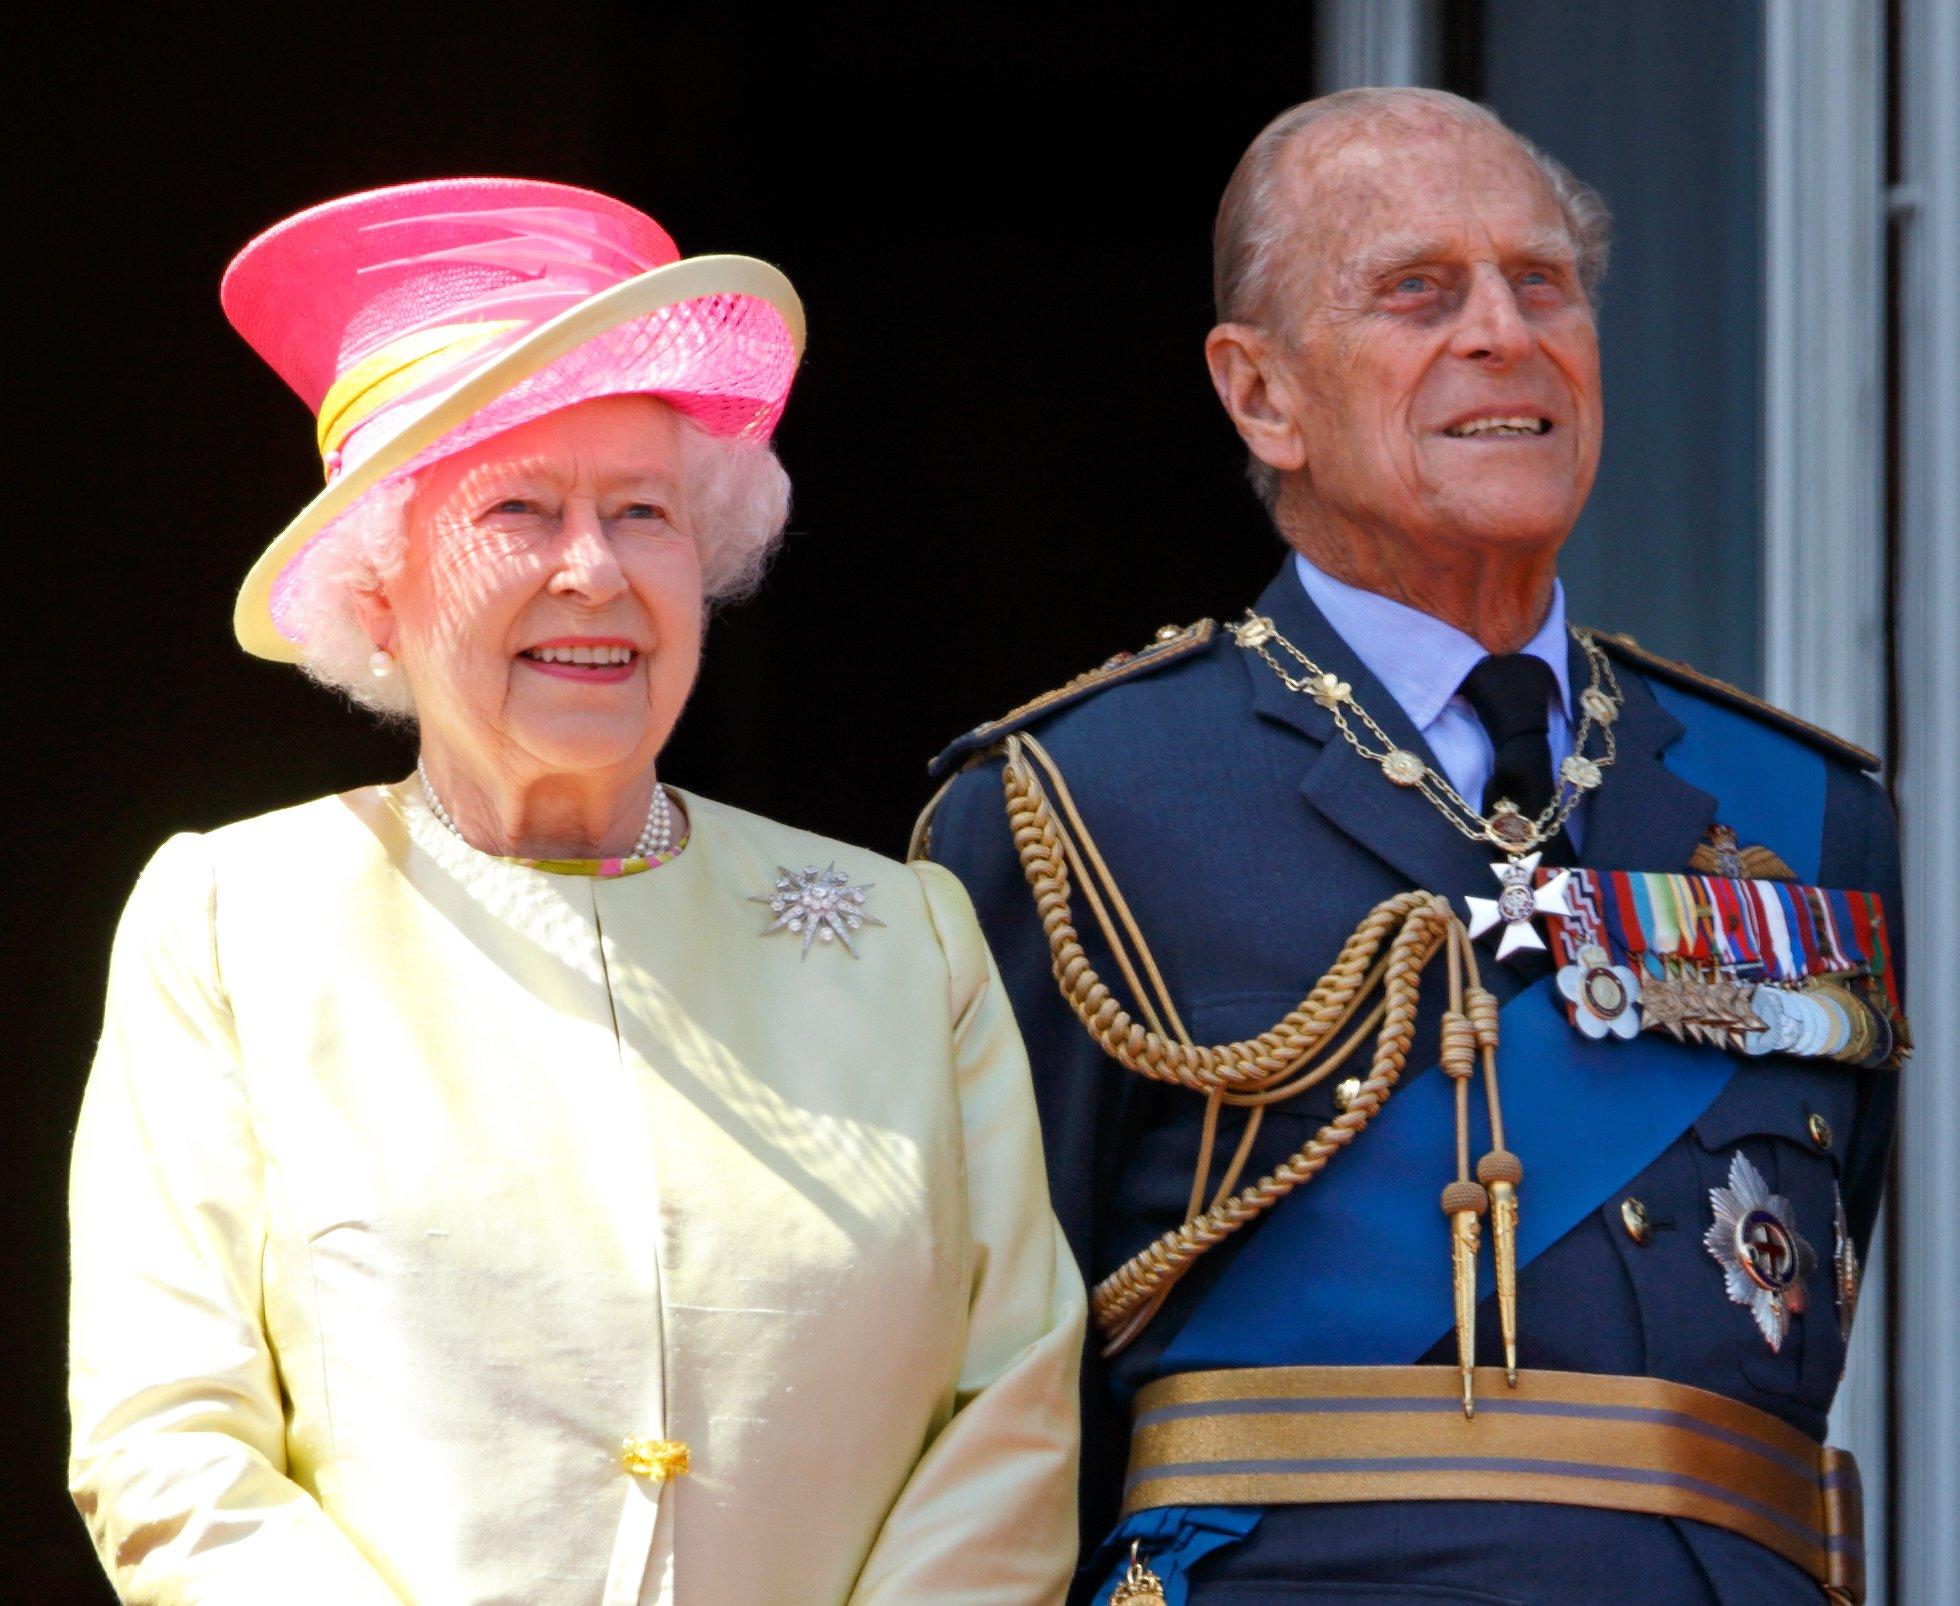 Queen Elizabeth Ii and Duke of Edinburgh Photo C GETTY IMAGES 0251